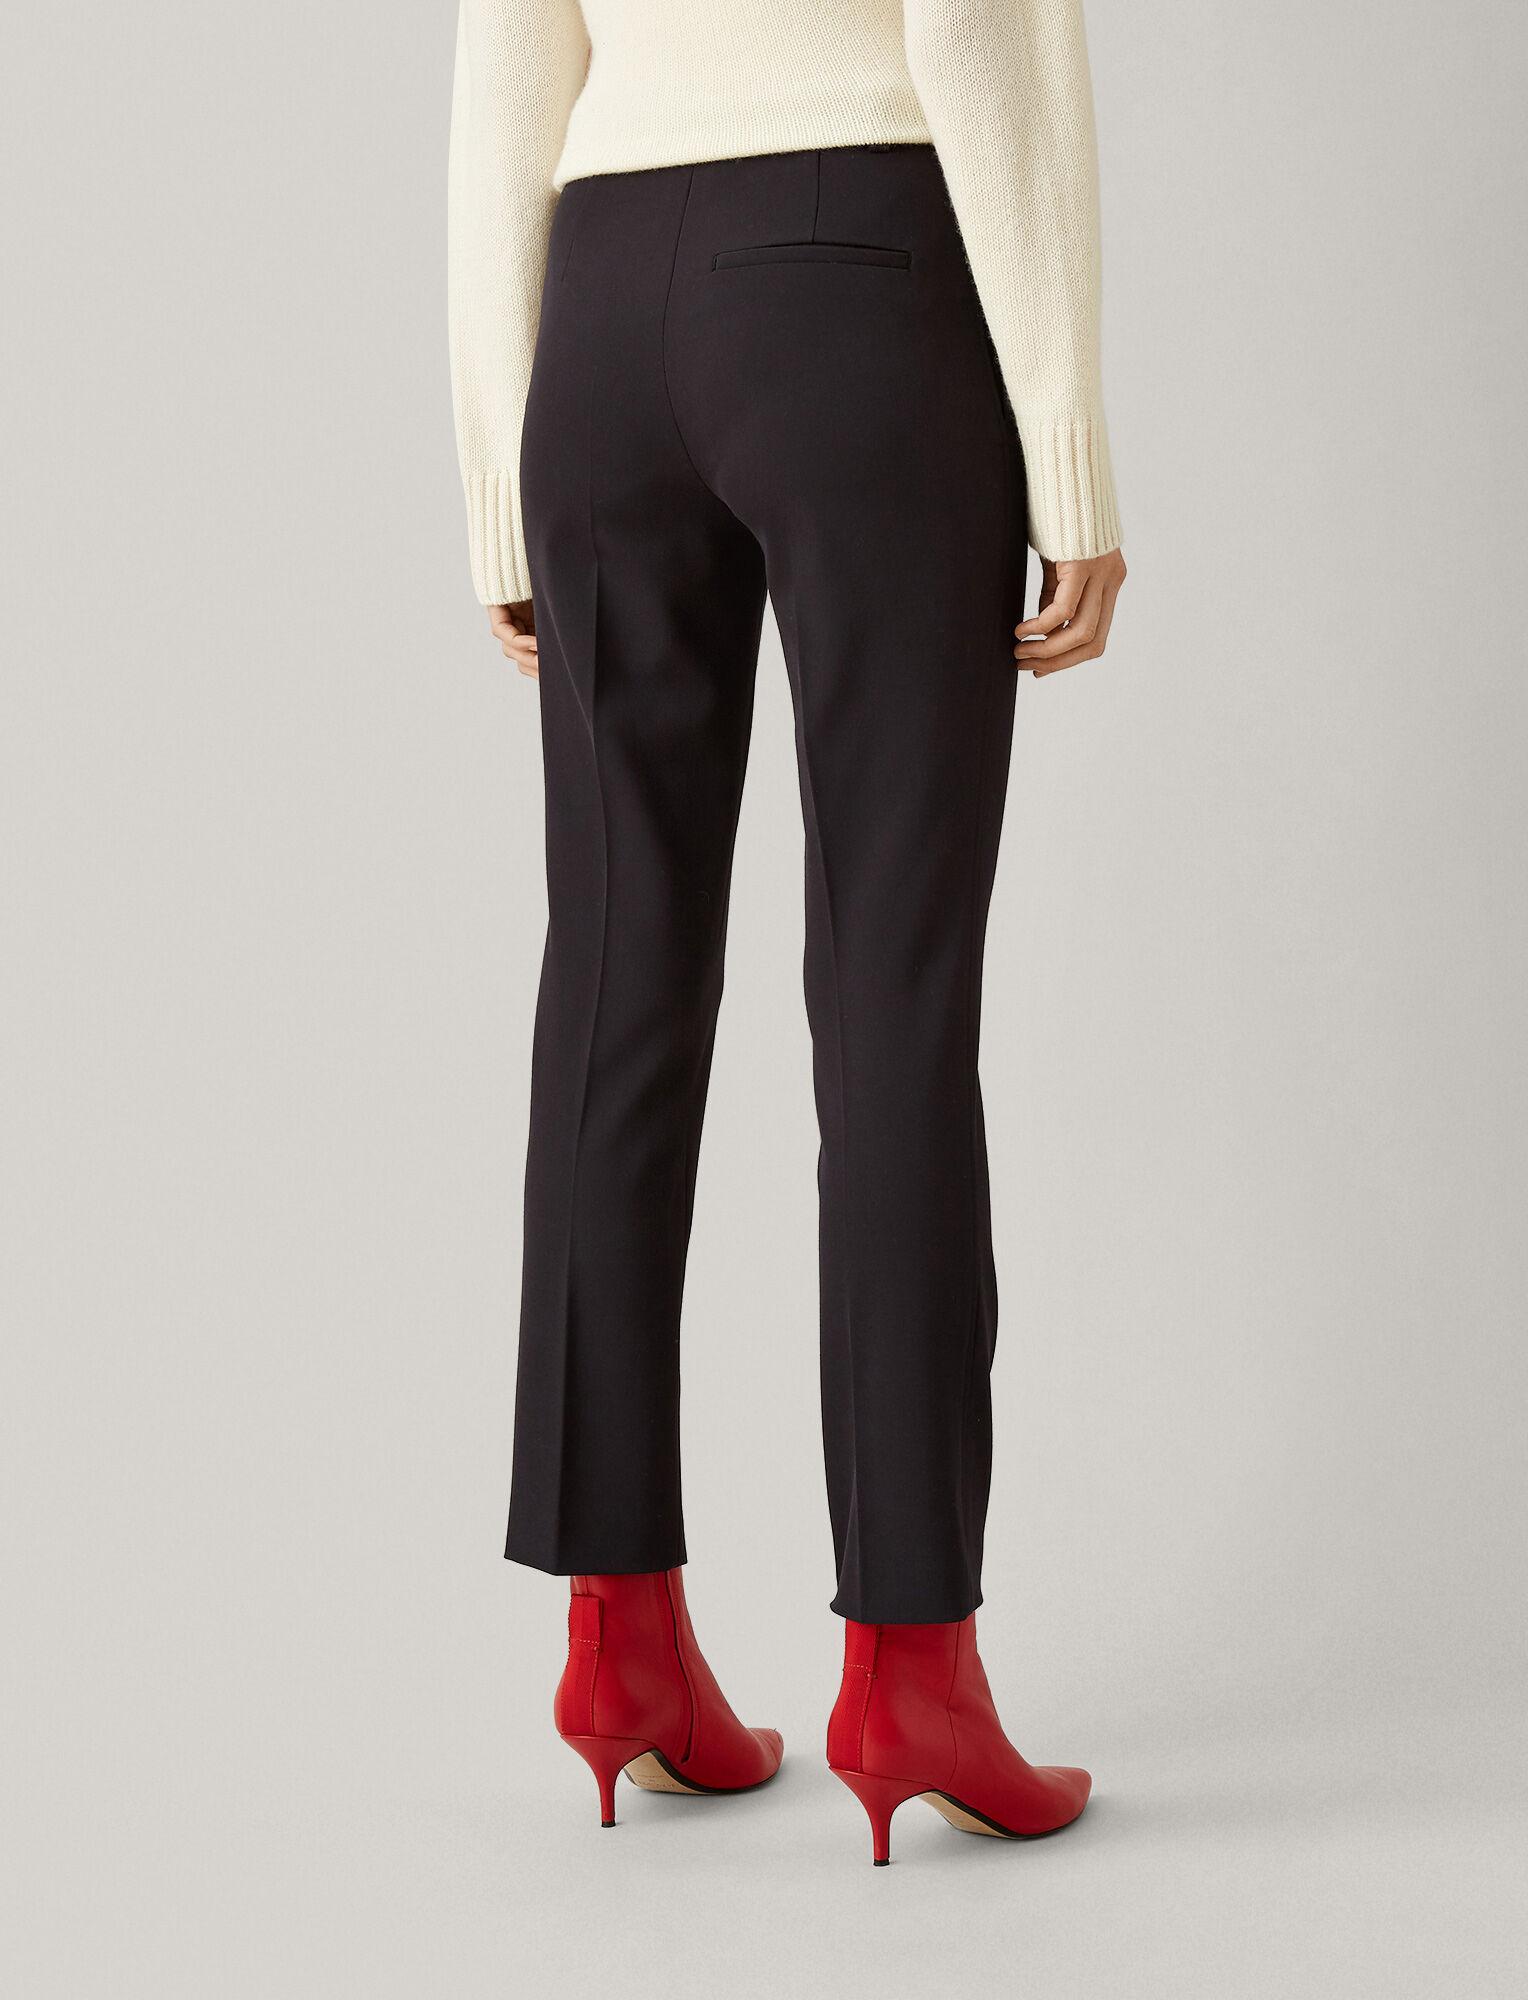 Joseph, Zoom Comfort Wool Trousers, in NAVY